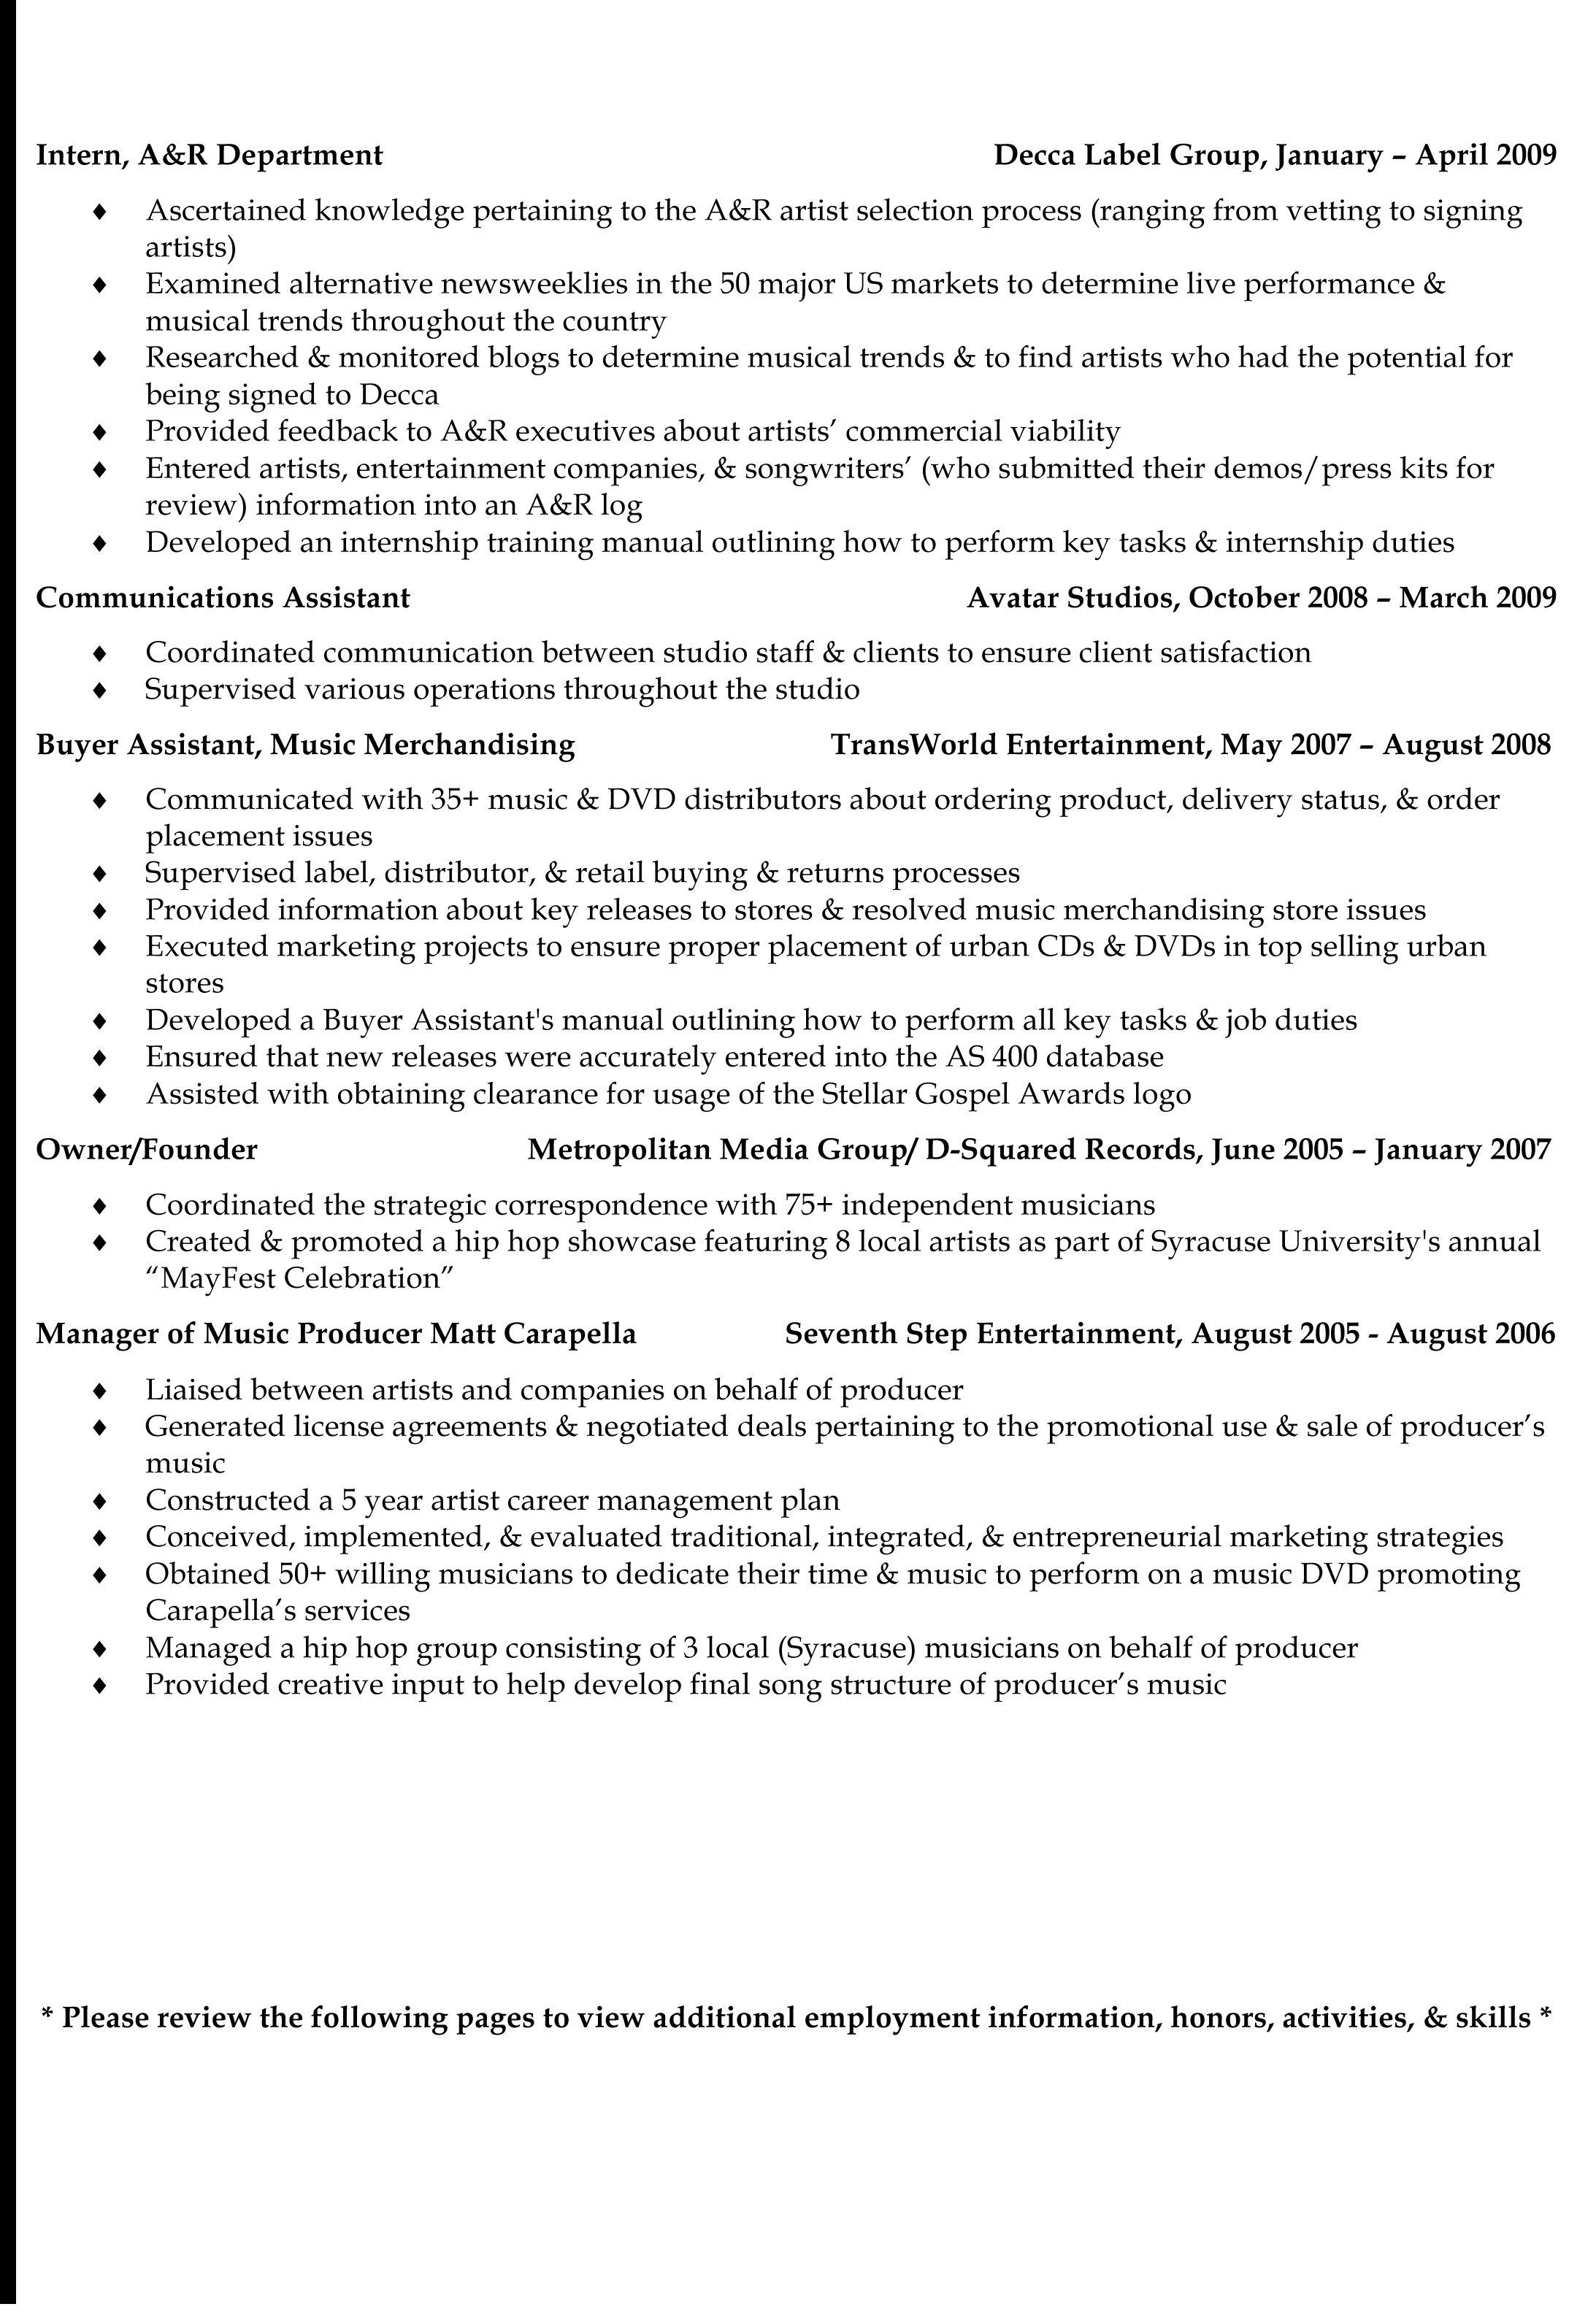 Kathryn Sano S Events Marketing Resume Page 4 Kathryn N